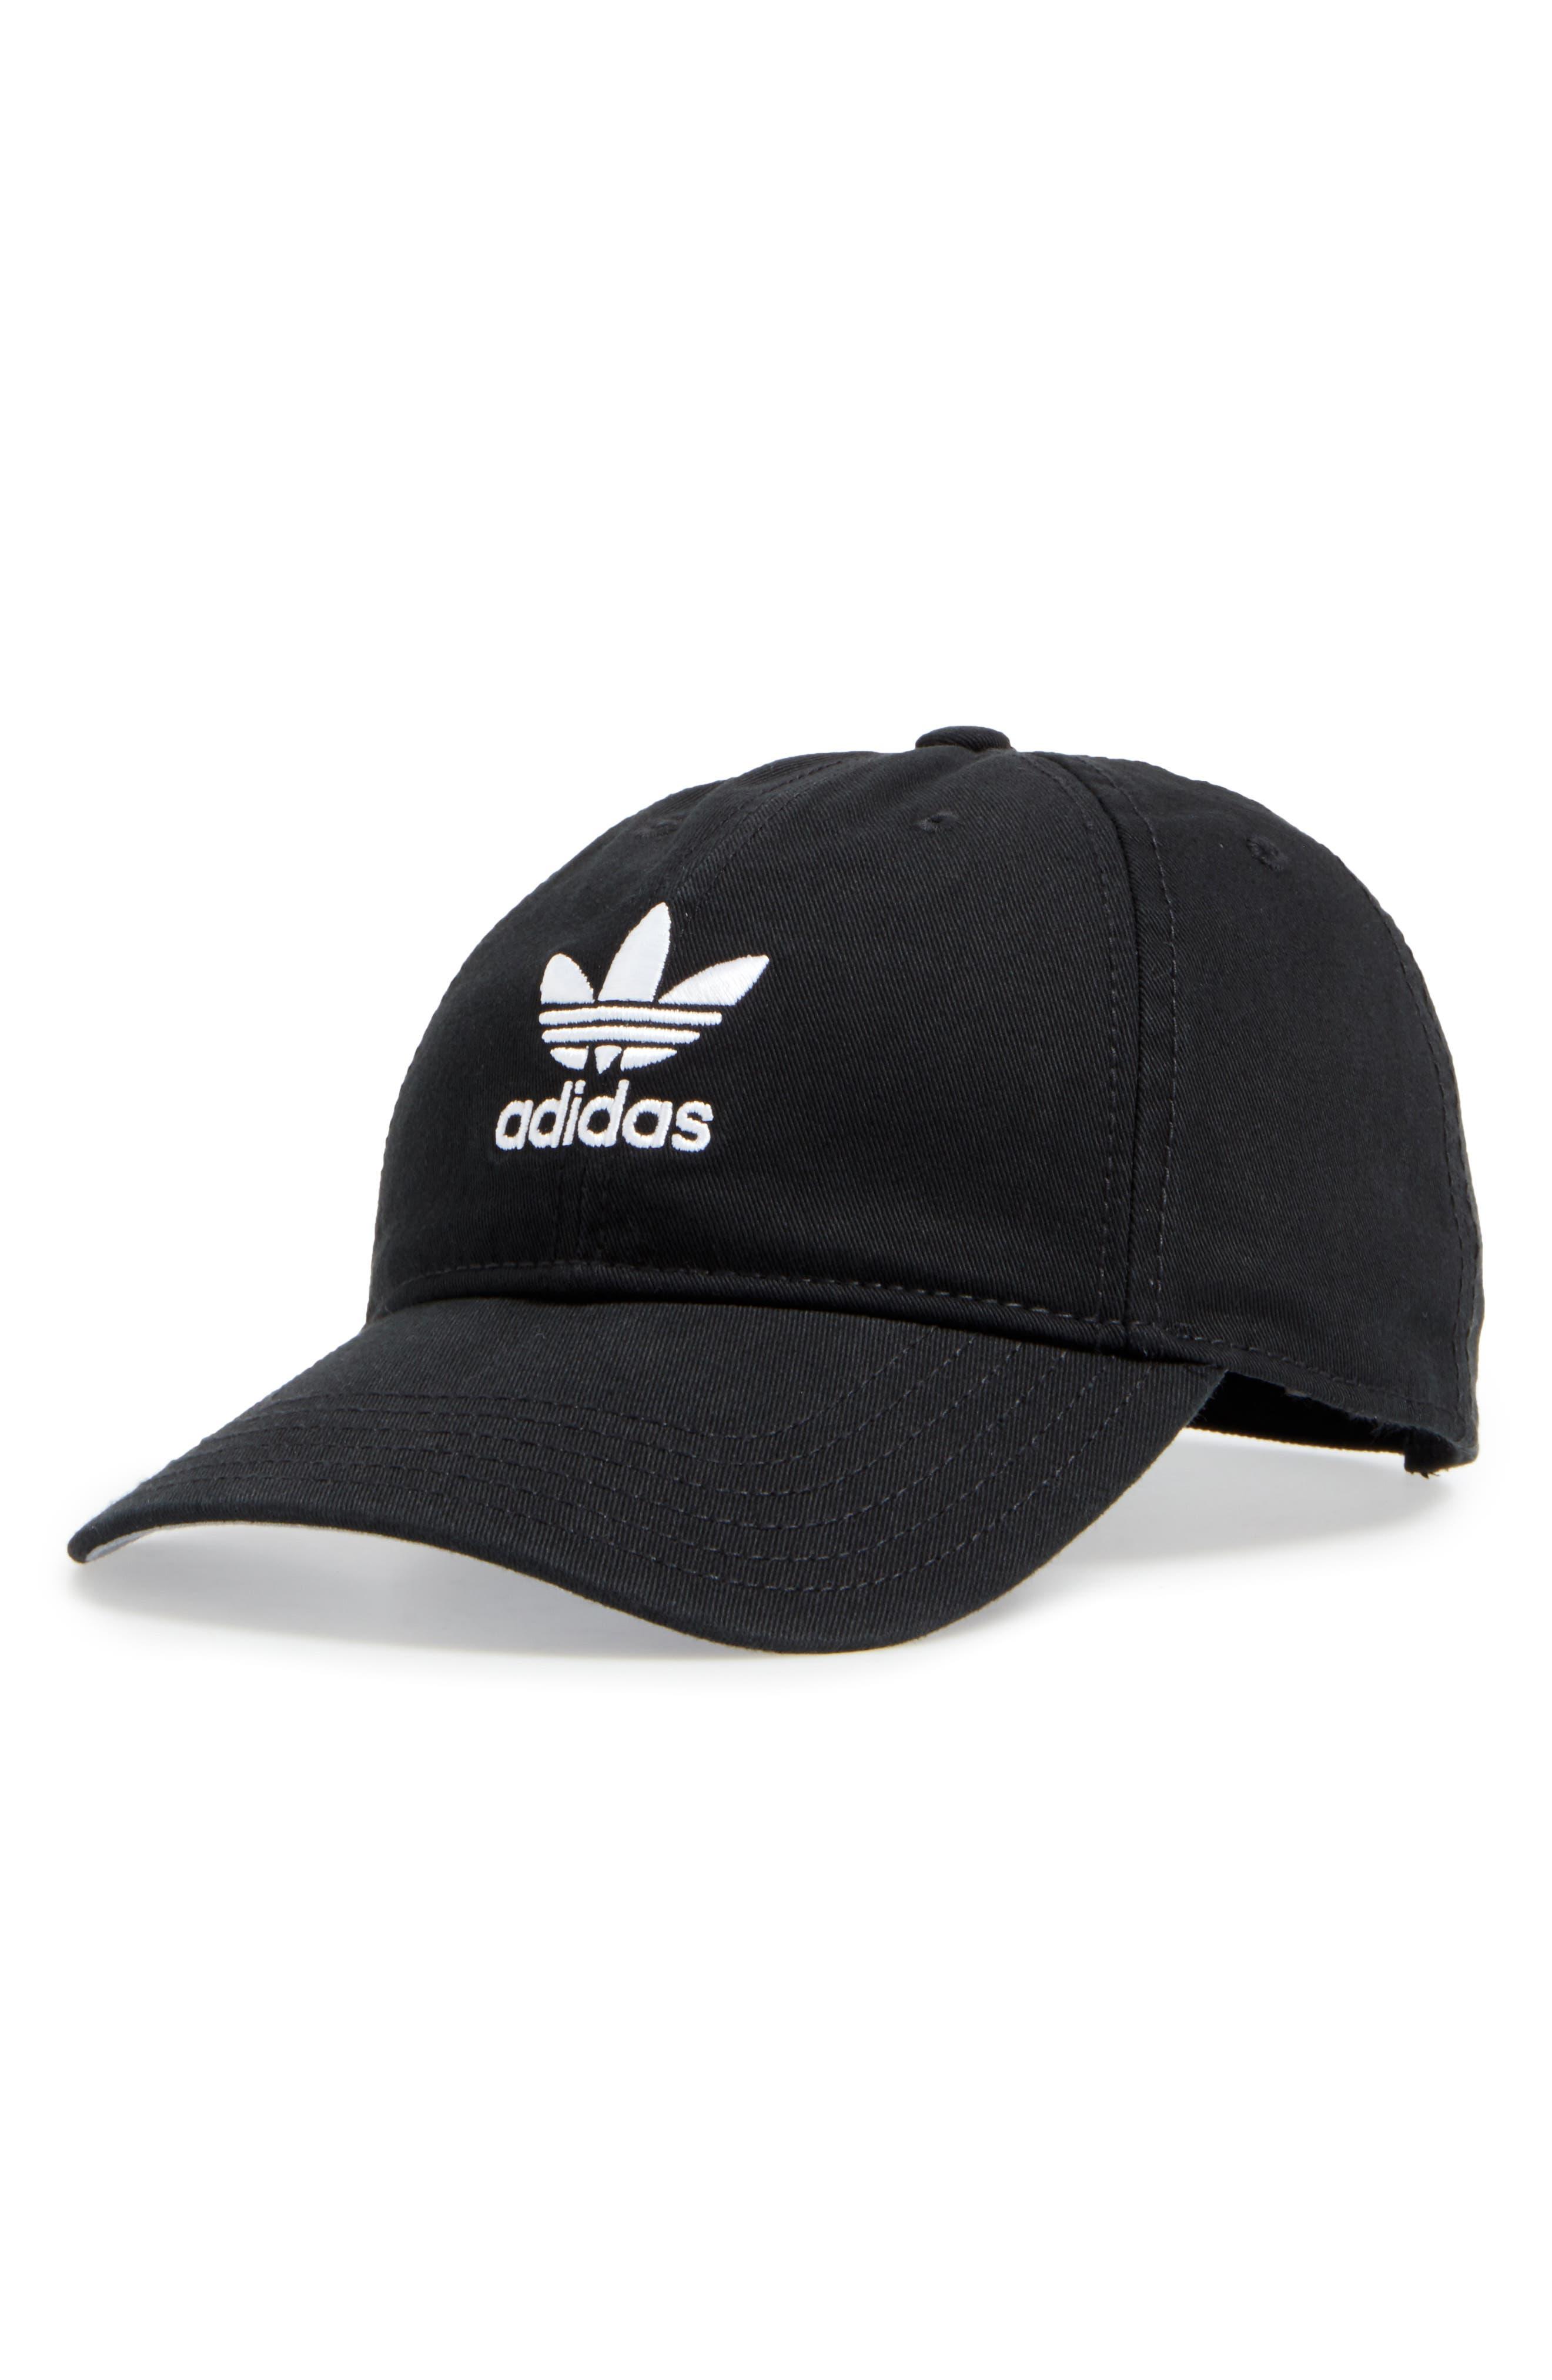 Buy adidas hats for women - Best women s adidas hats shop - Cools.com af4a95133e